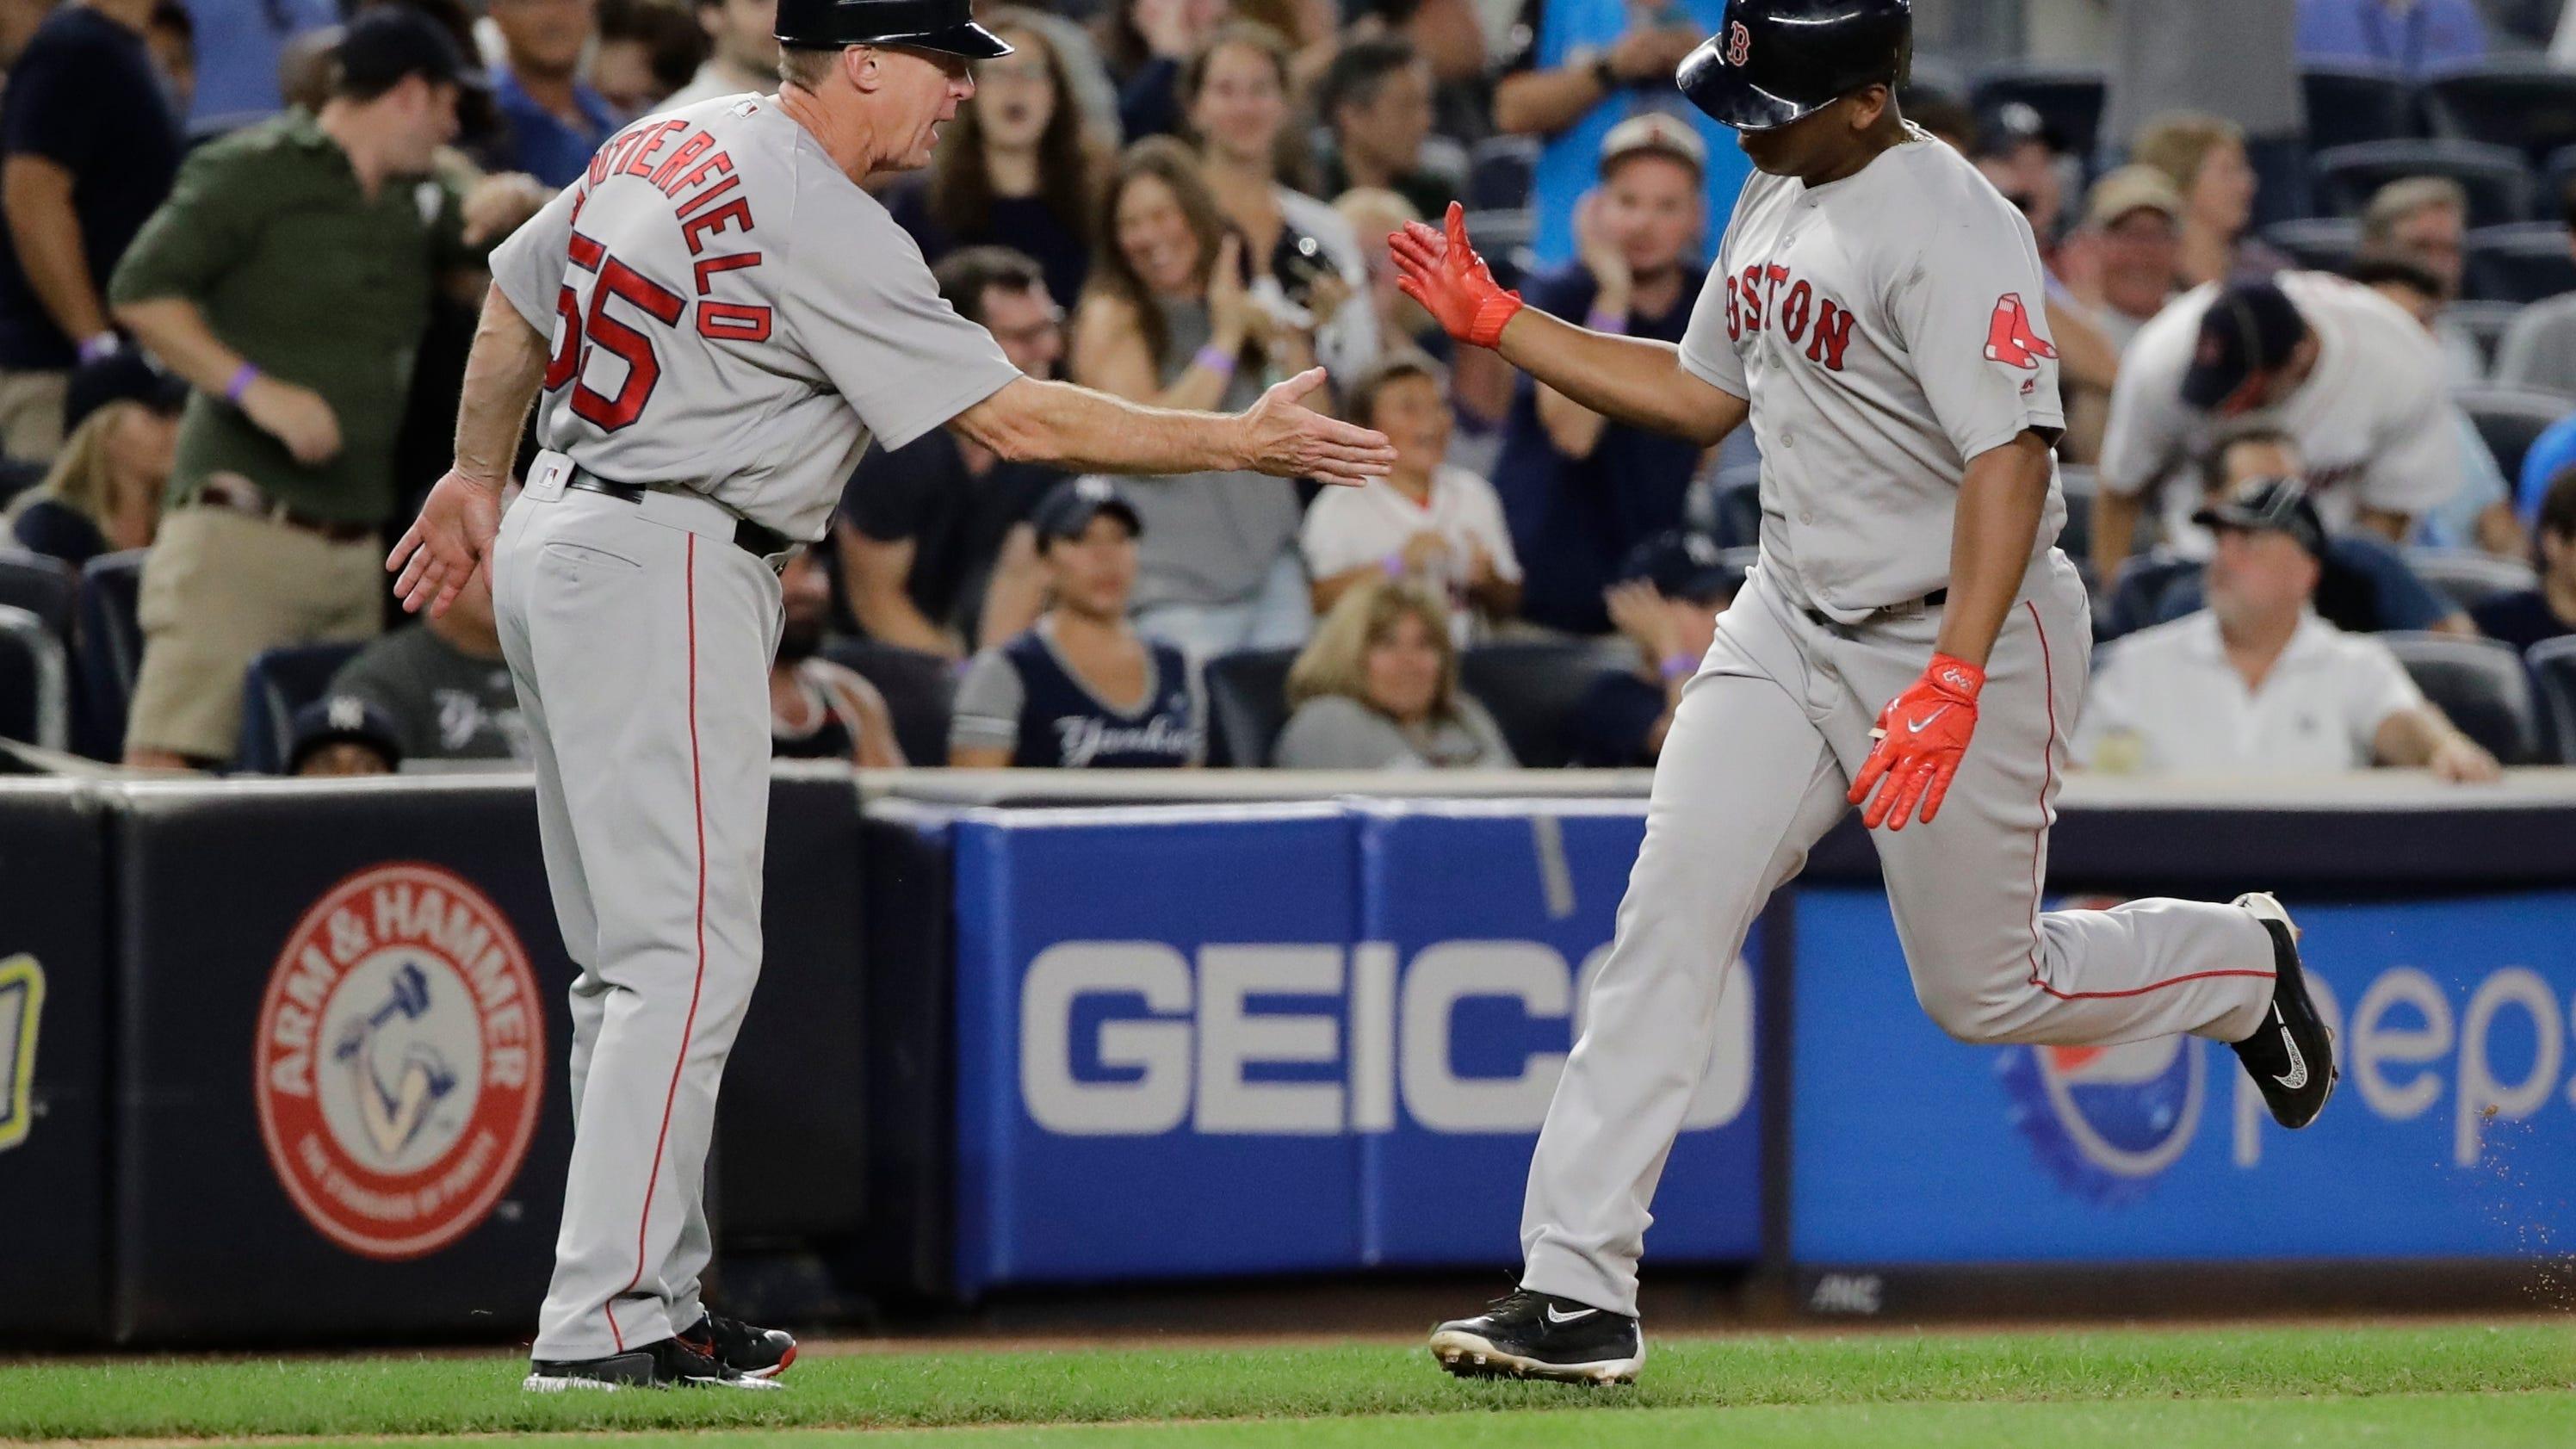 Red Sox rookies Devers, Benintendi key win over Yanks in 10